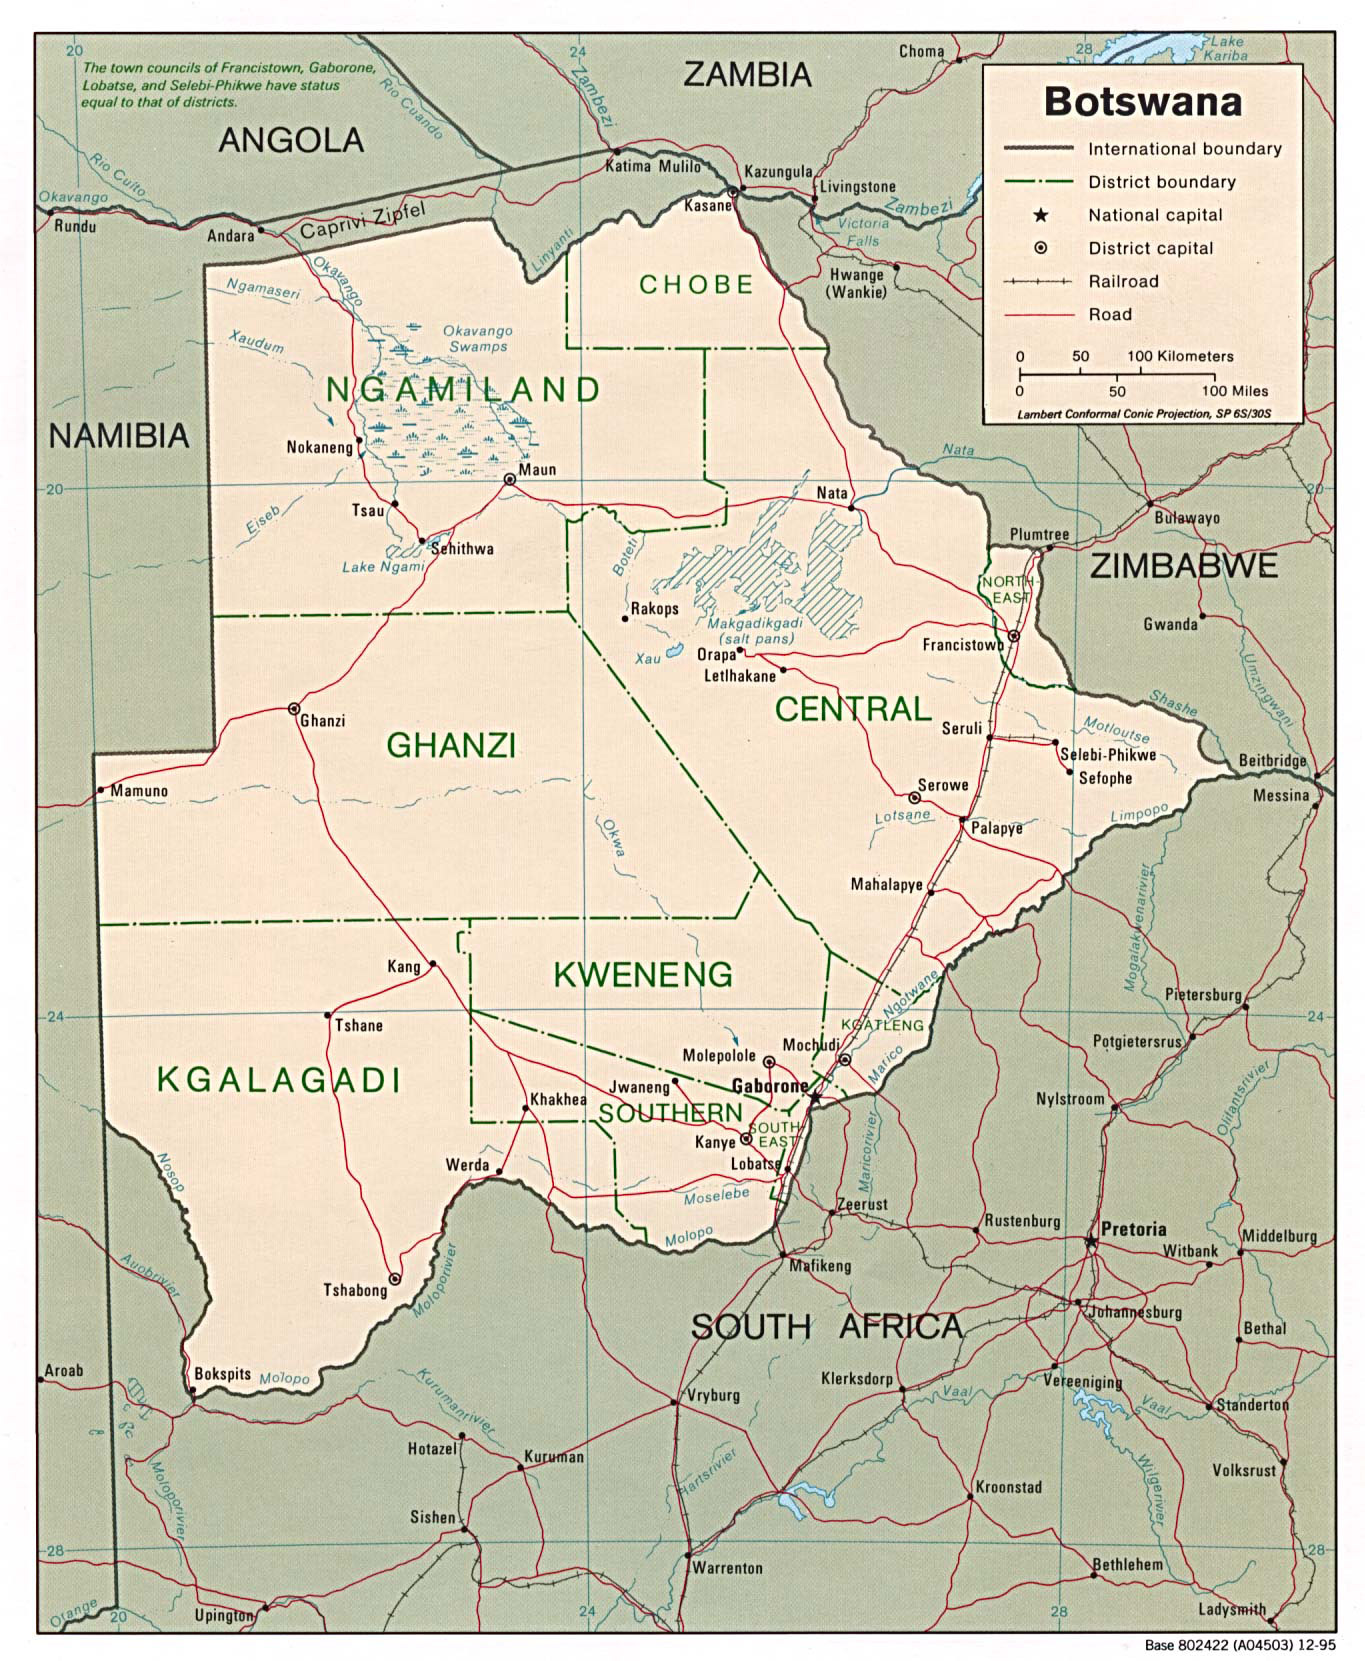 Detailed political and administrative map of Botswana Botswana